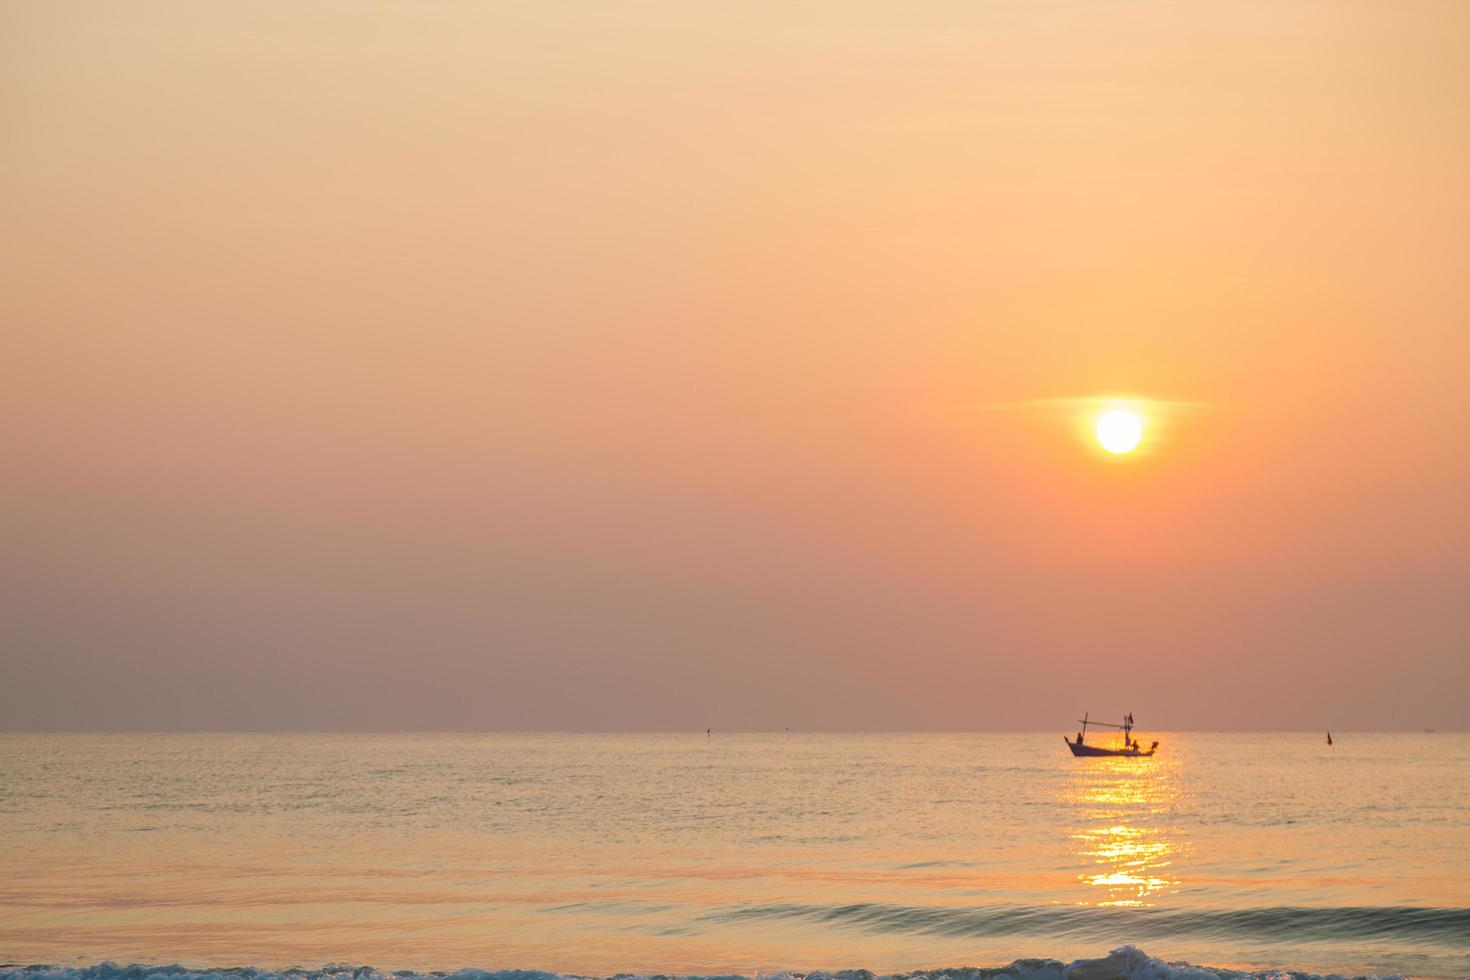 Fischerboot auf dem Meer bei Sonnenaufgang foto